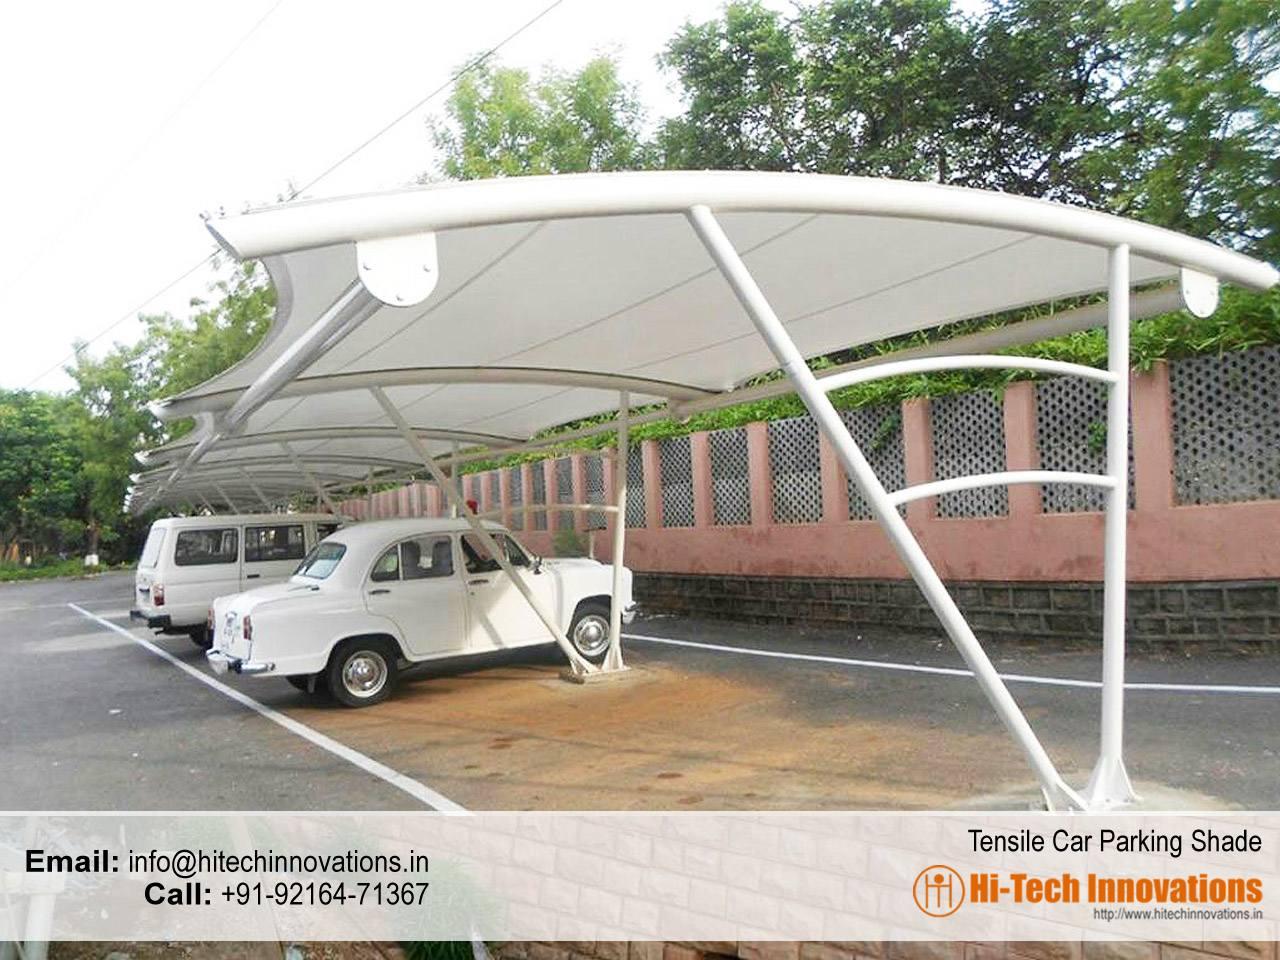 Car Parking Shed Tent : Car shed manufacturer in chandigarh mohali panchkula